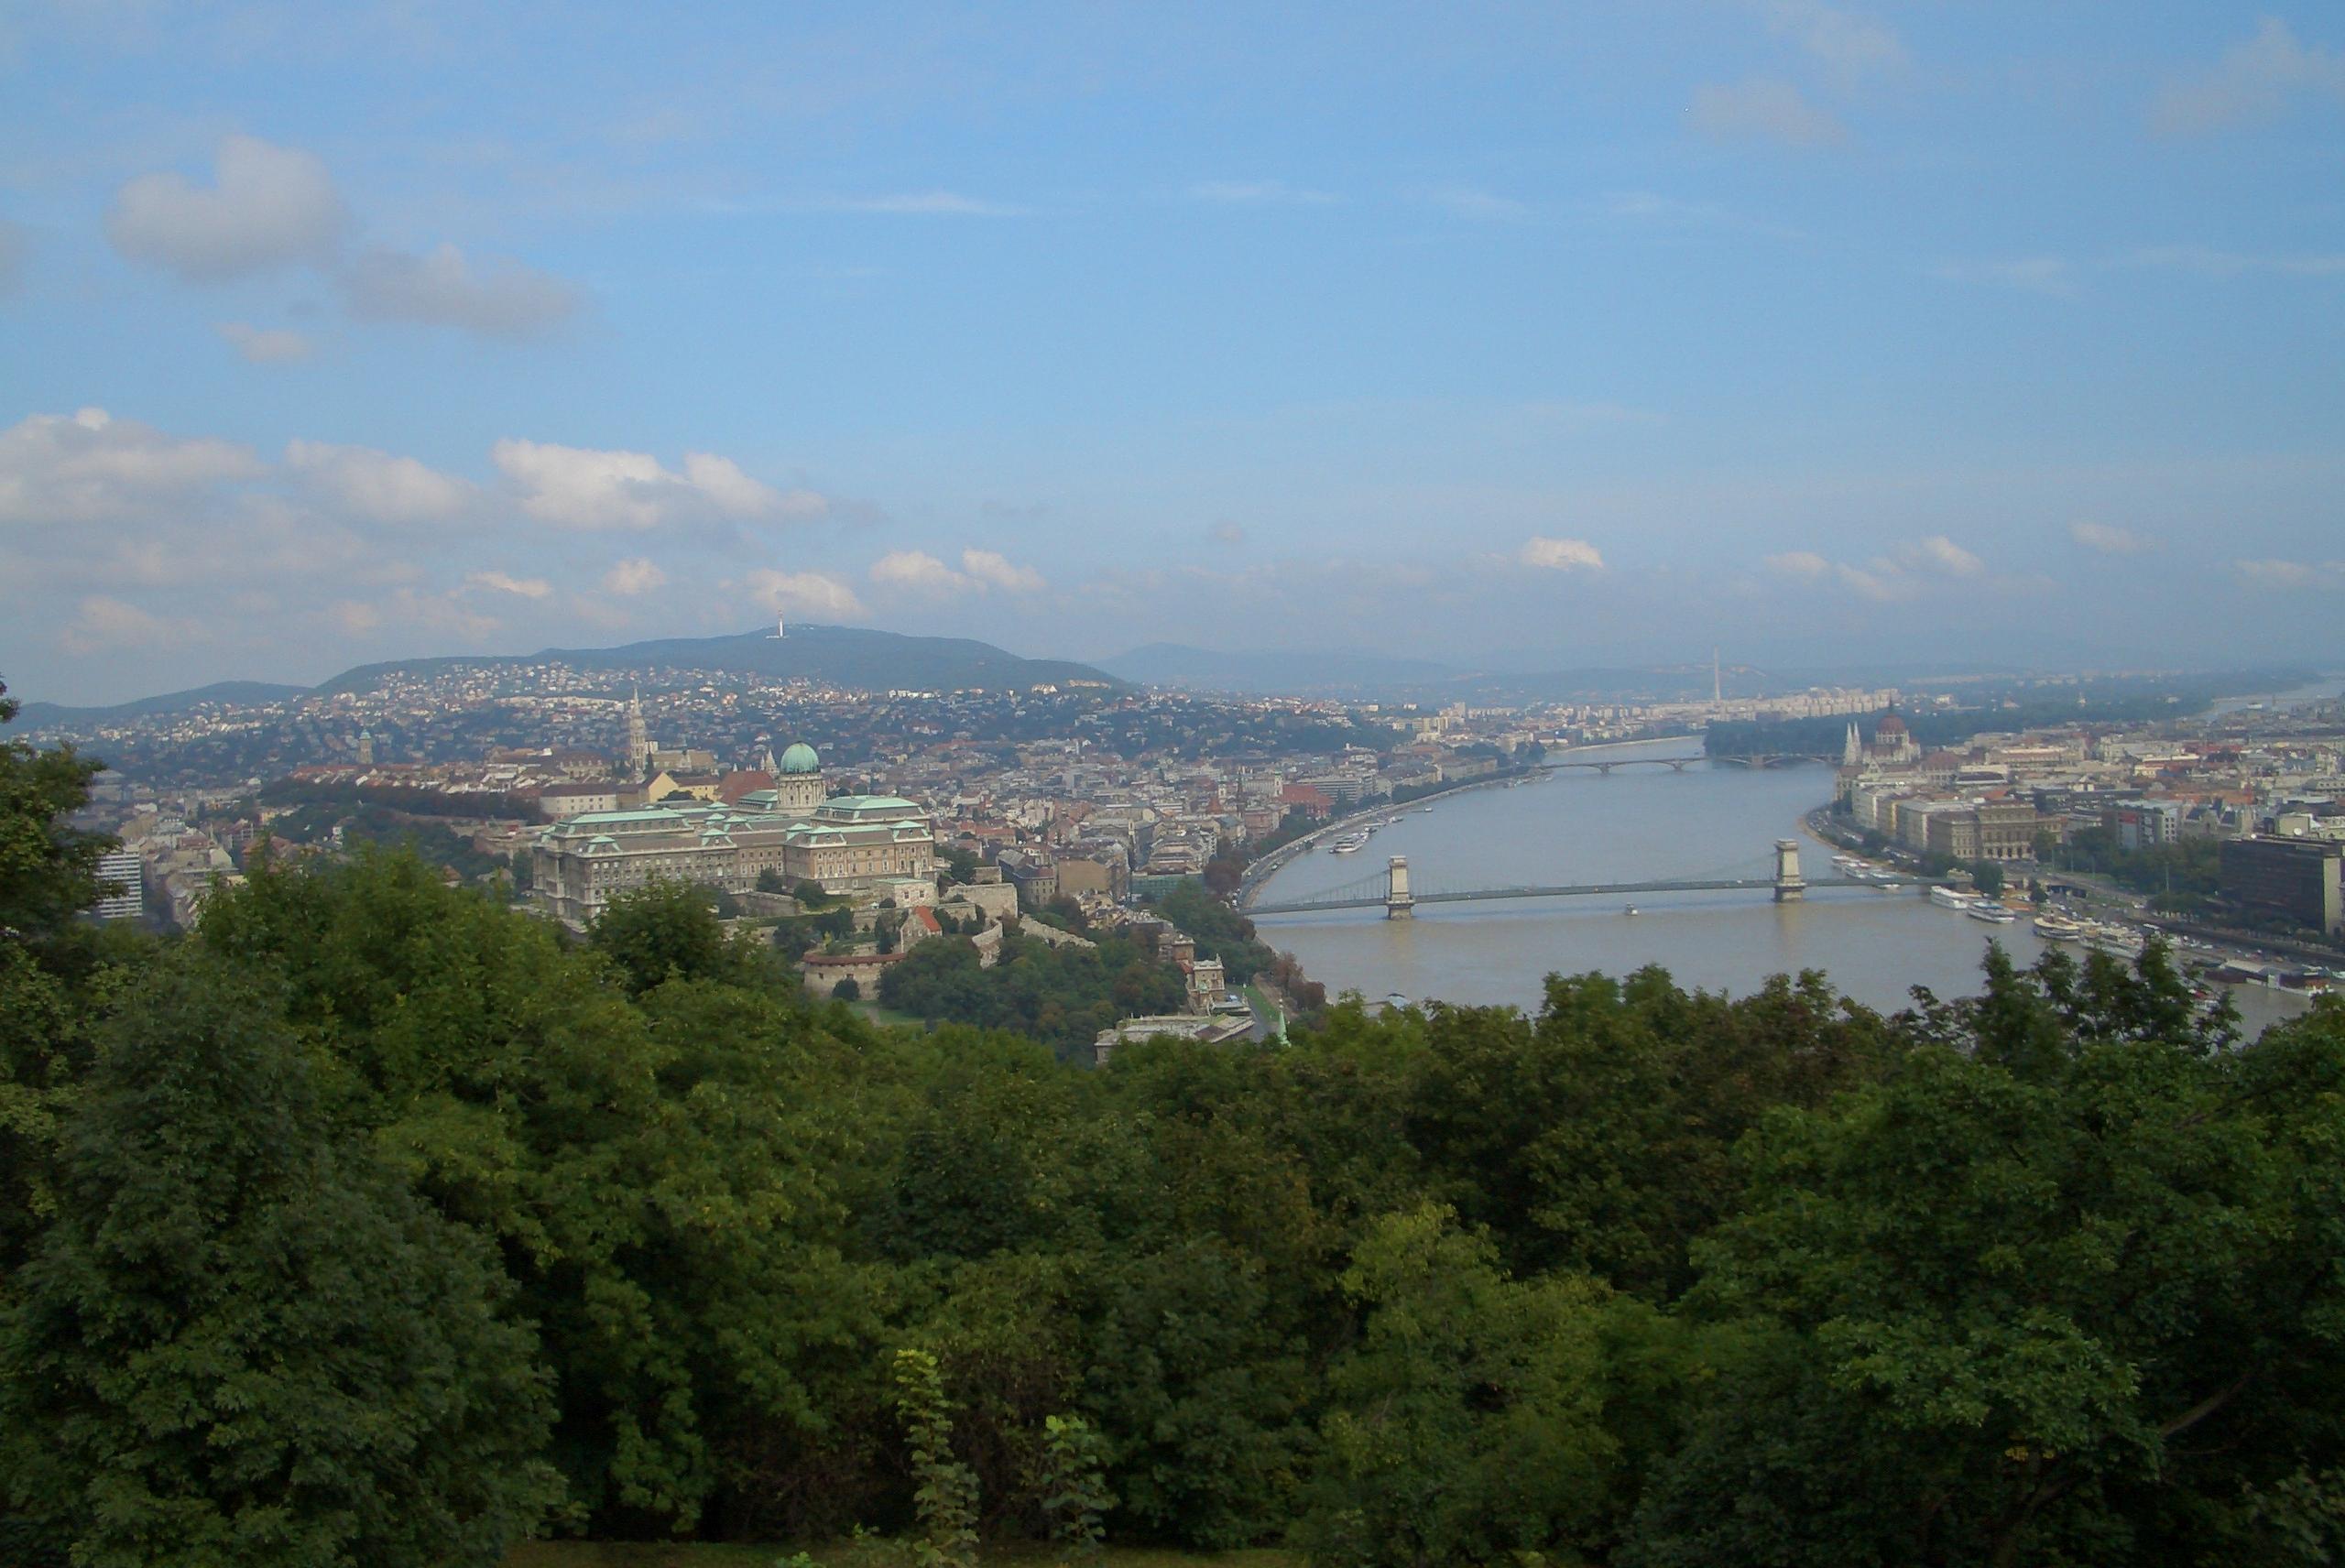 BUDAPEST – verdens vakreste by? | Knuts reiser